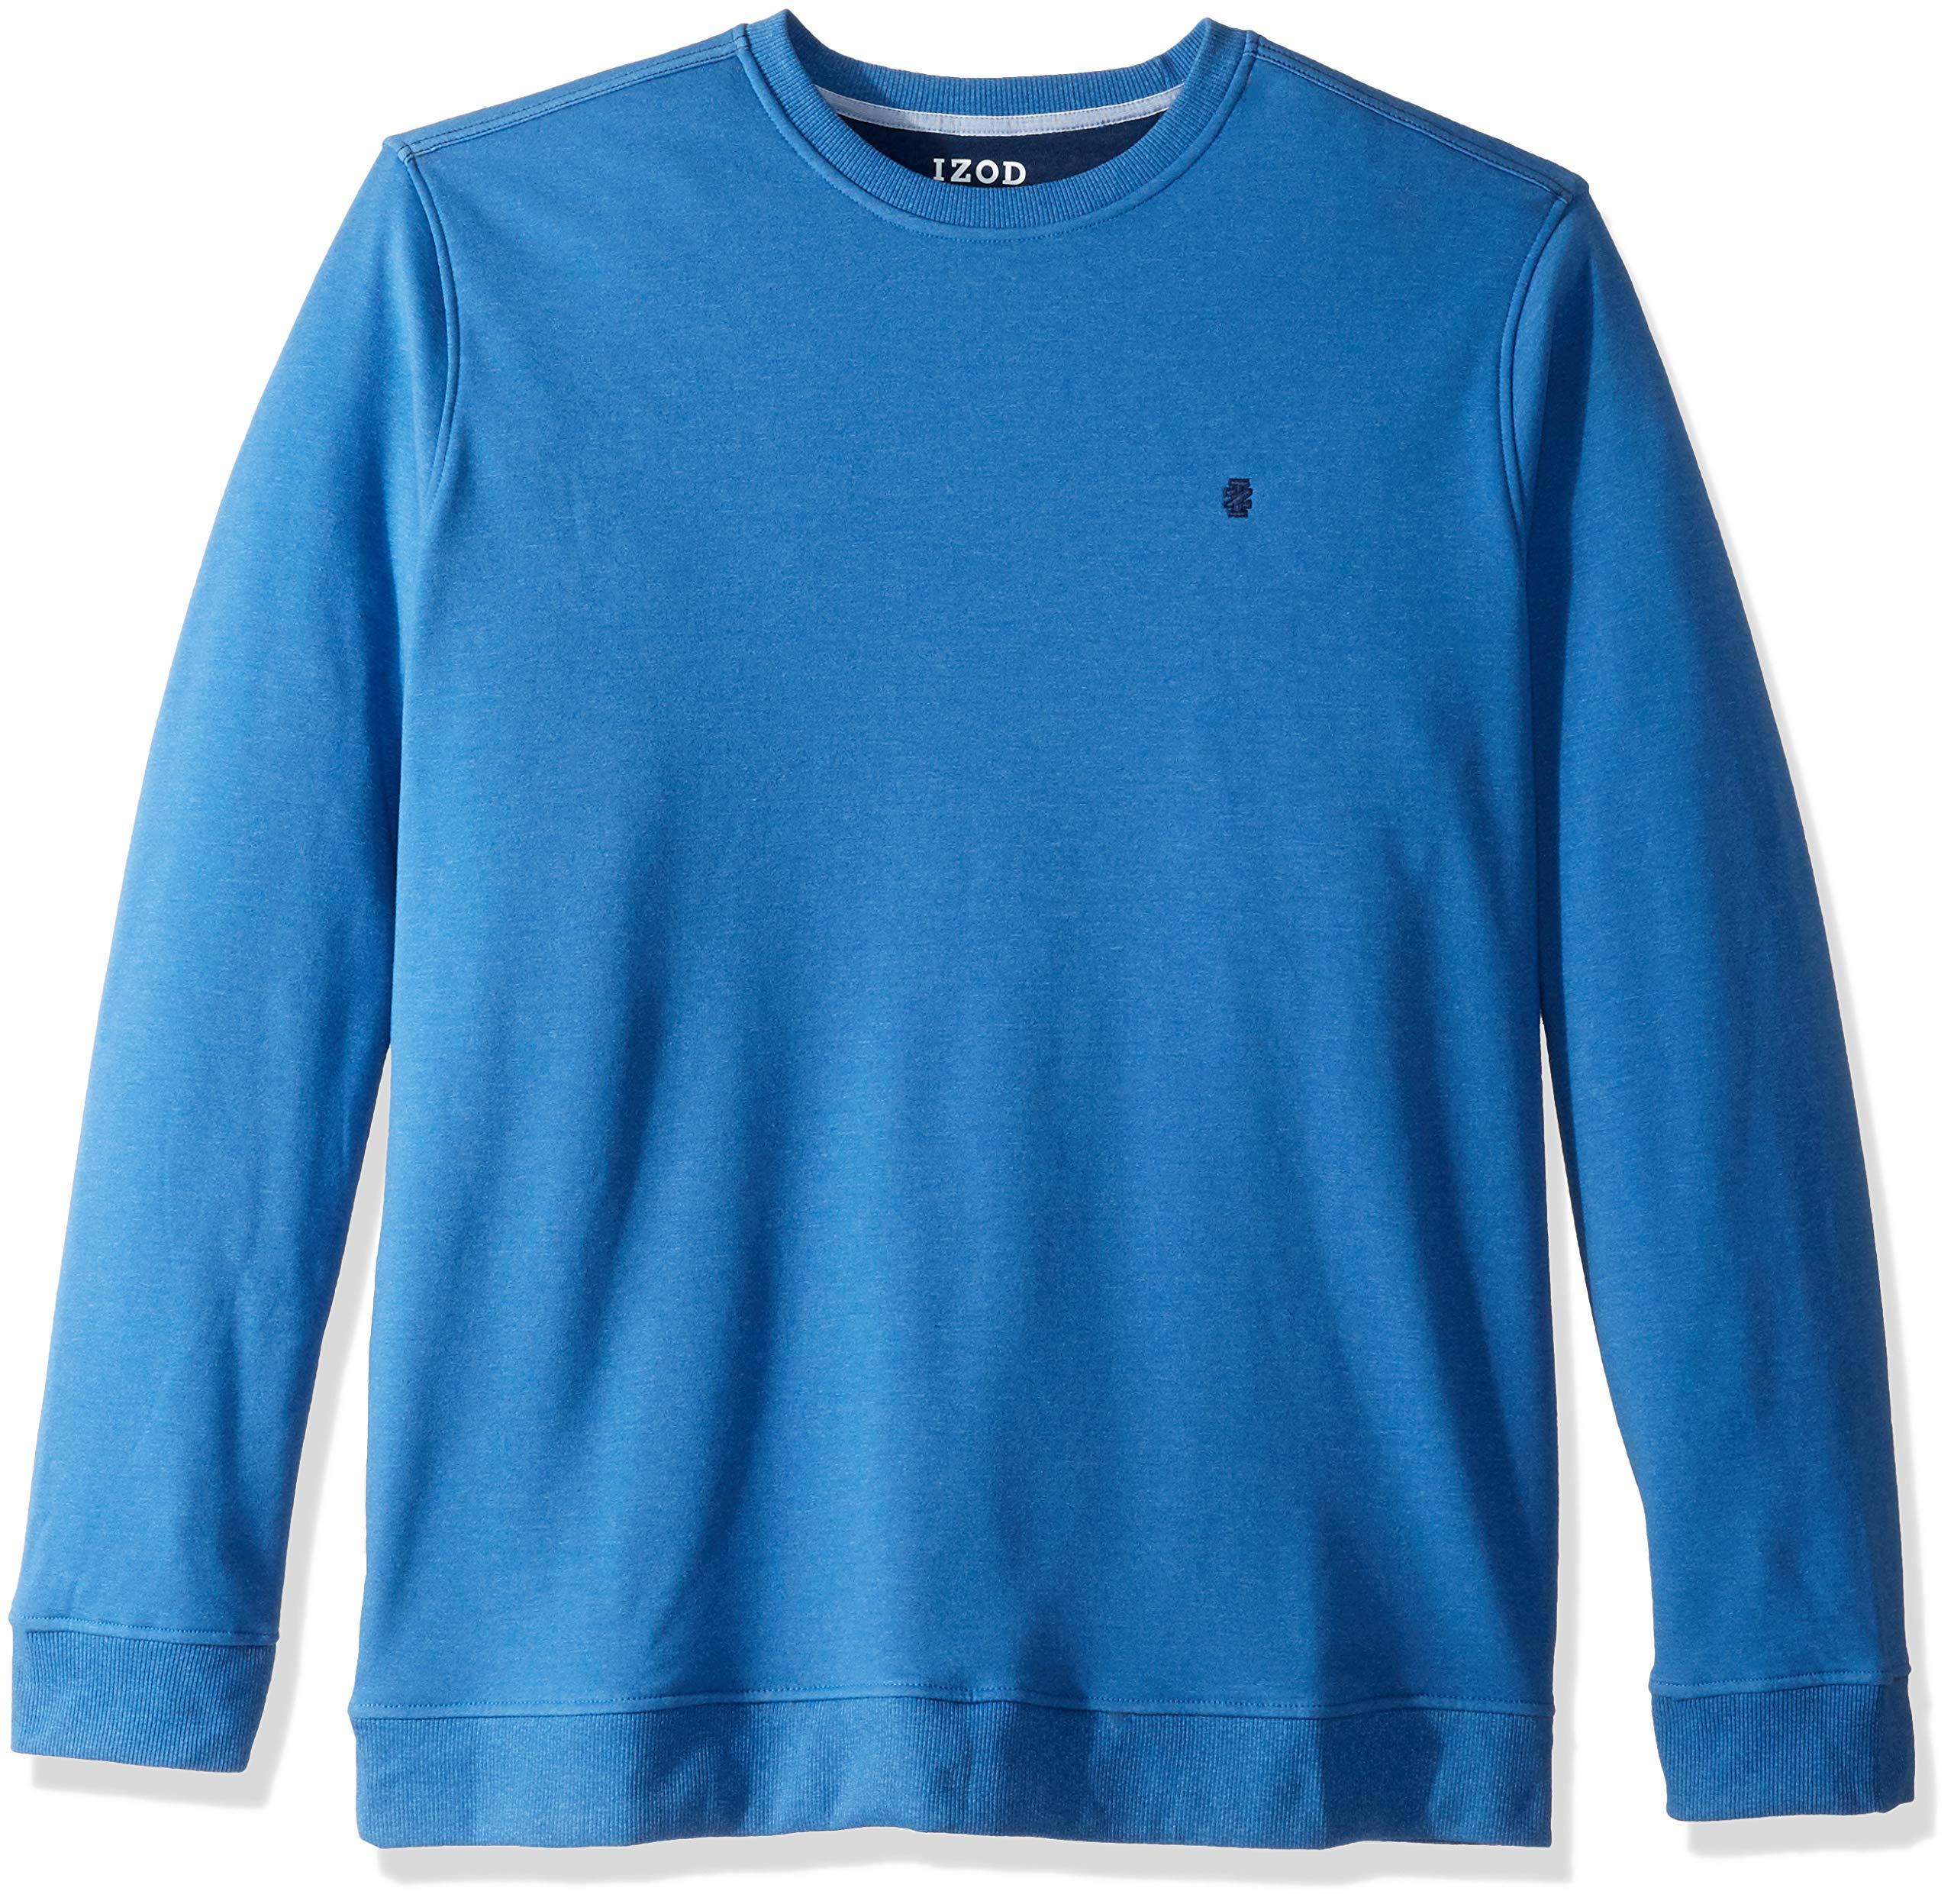 IZOD Men's Big and Tall Advantage Performance Crewneck Fleece Sweatshirt, Bright Cobalt, 2X-Large